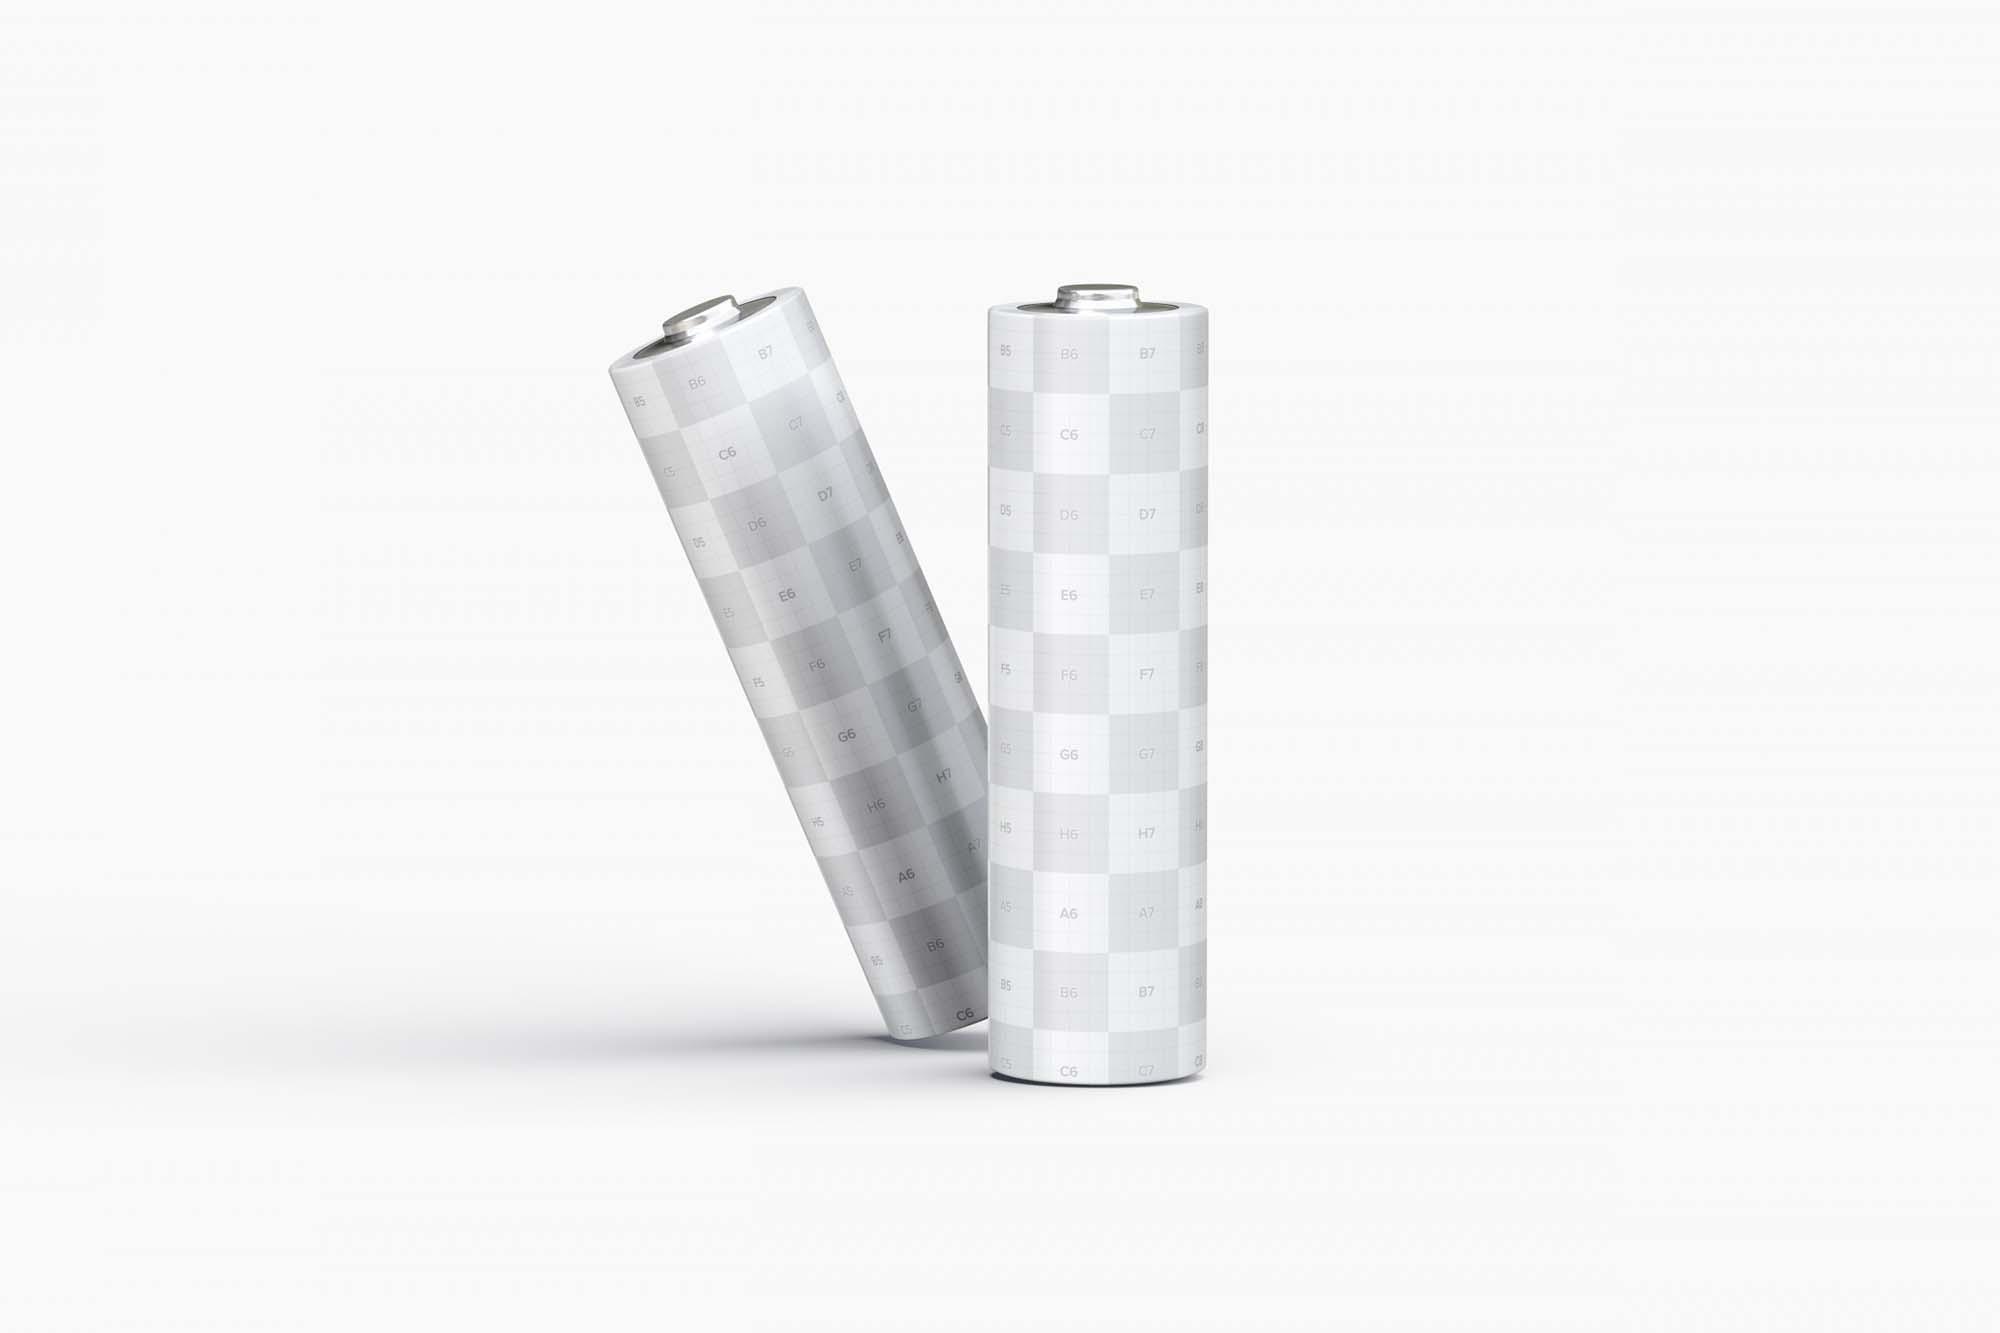 AA Batteries Mockup 2